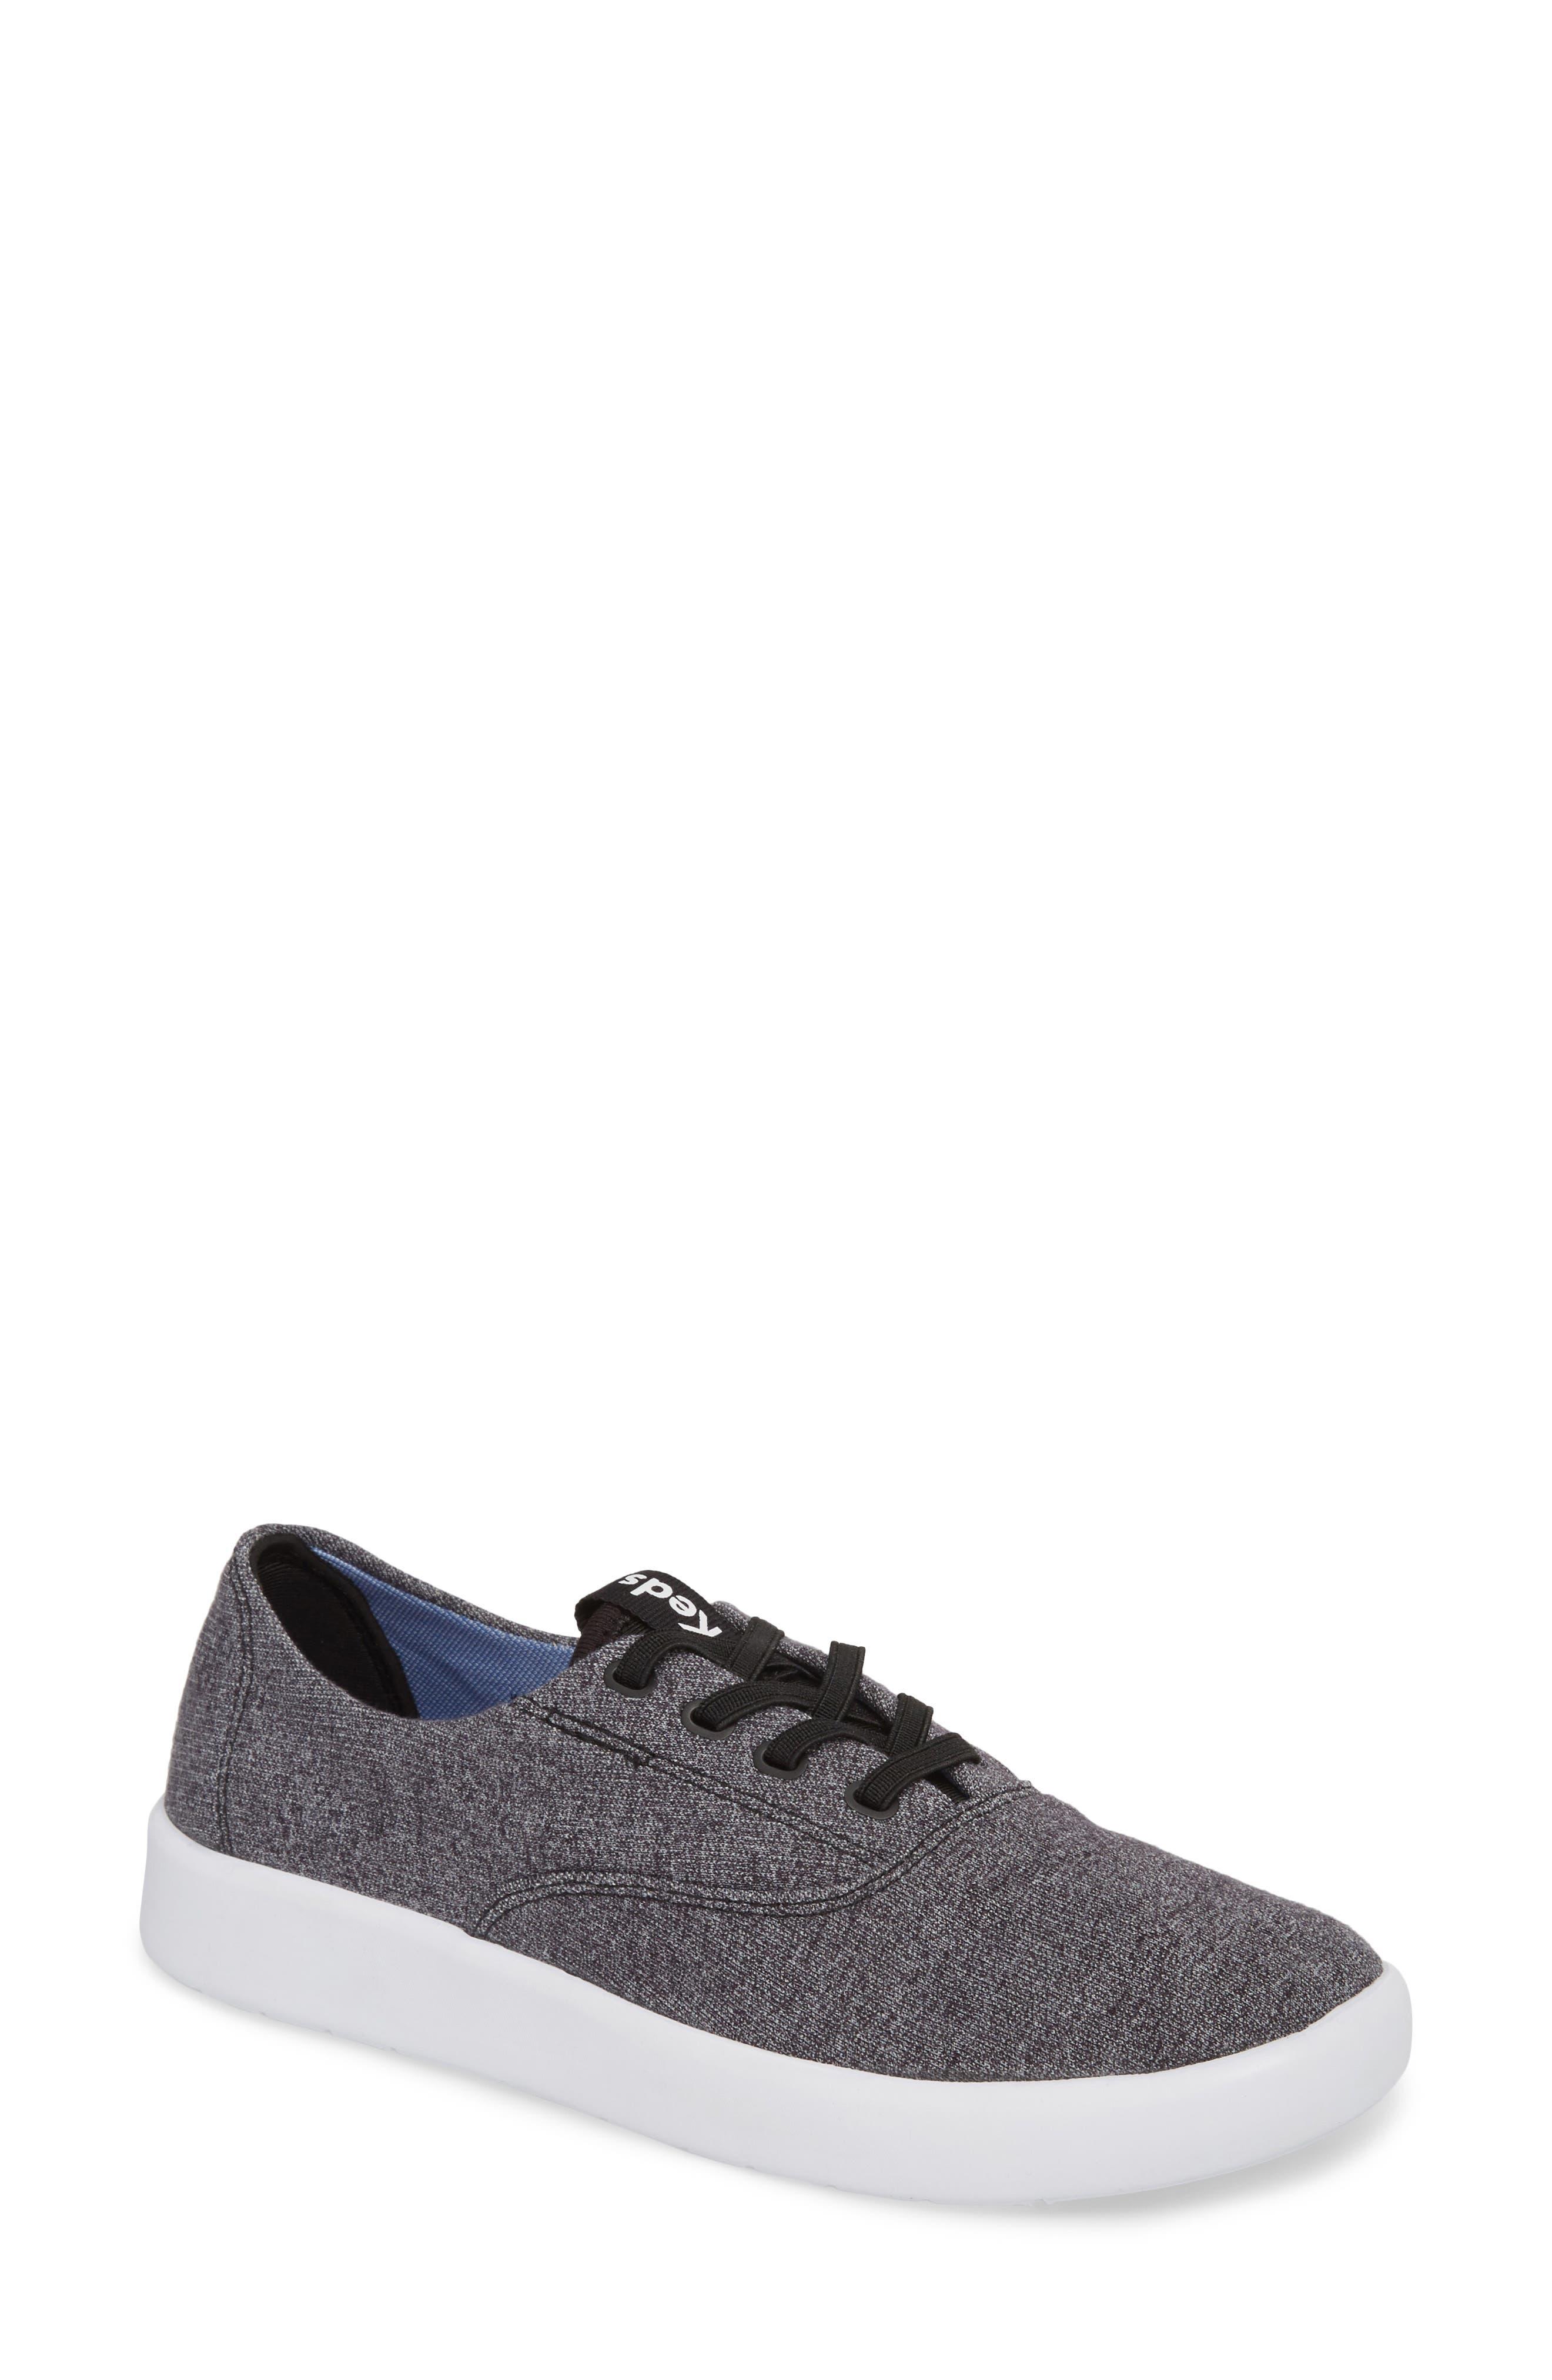 Studio Leap Sneaker,                         Main,                         color, Charcoal